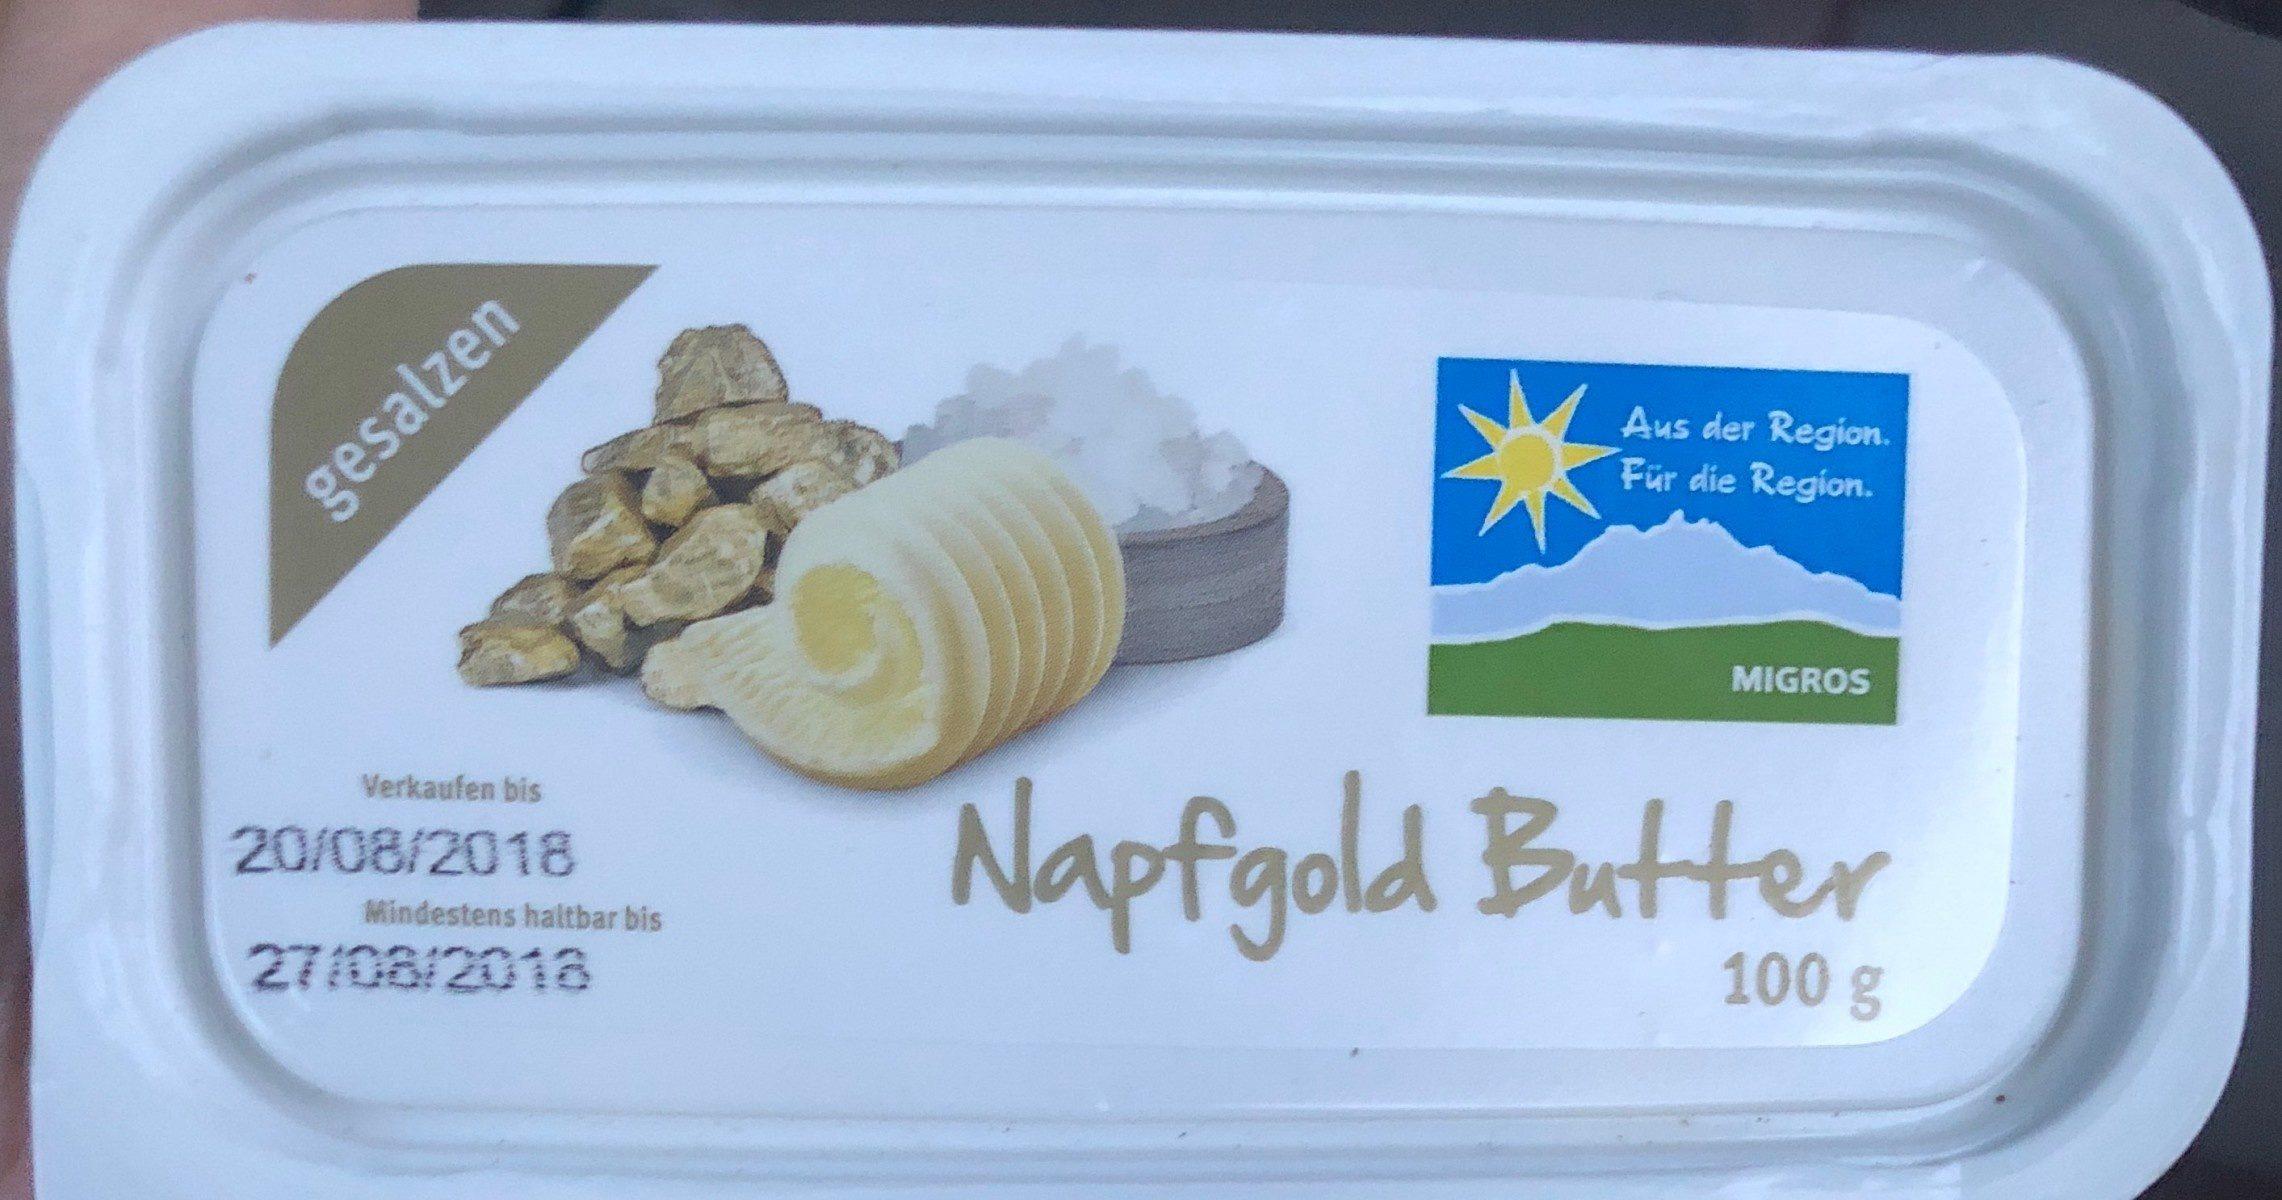 Beurre sale - Product - fr